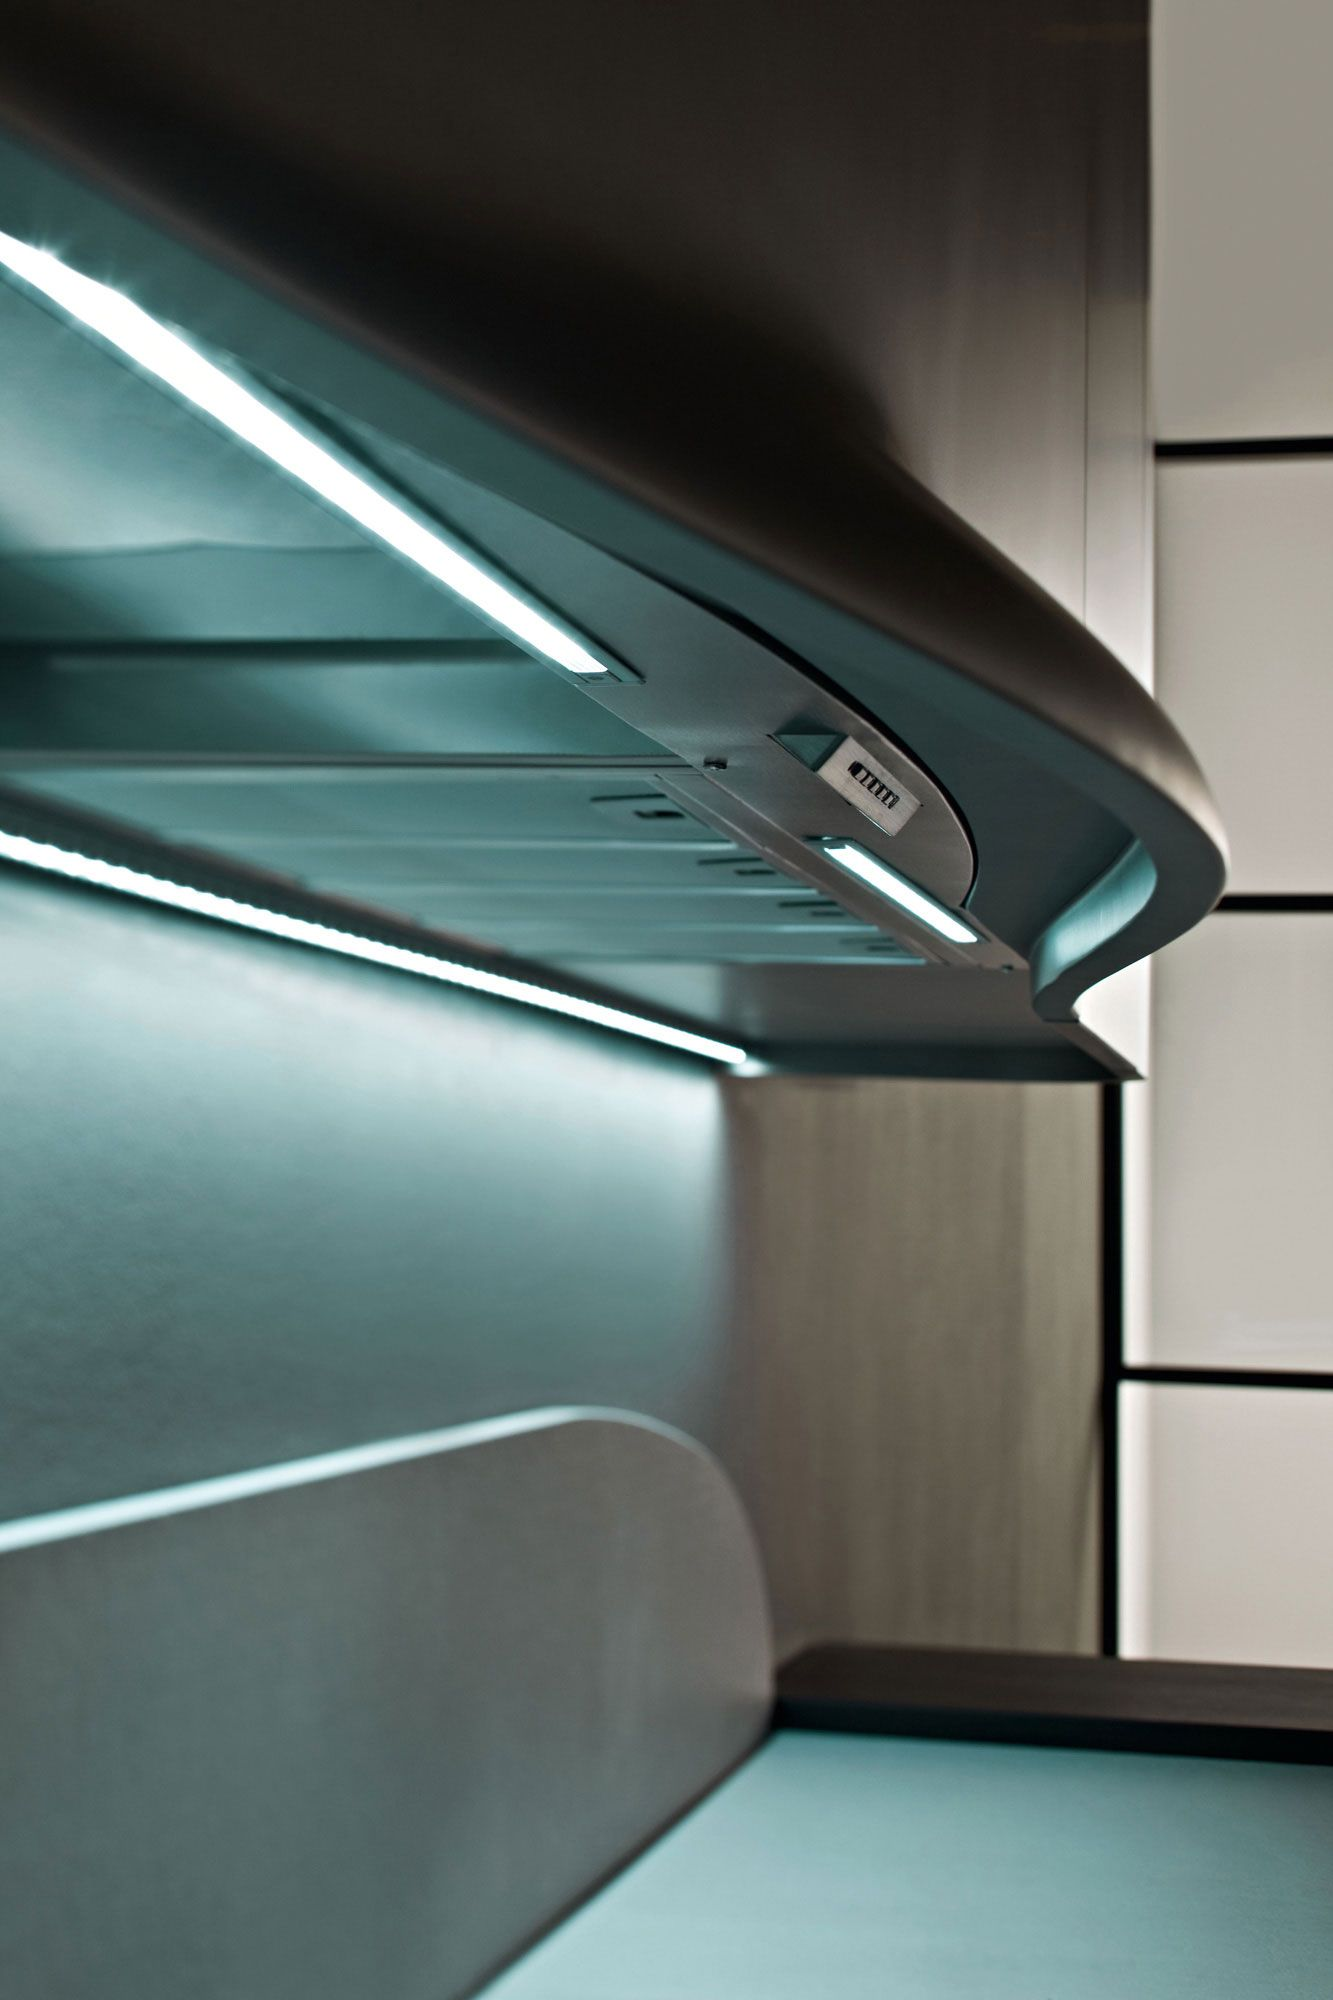 la cappa di una cucina illuminata da barre led a luce fredda | Barre ...